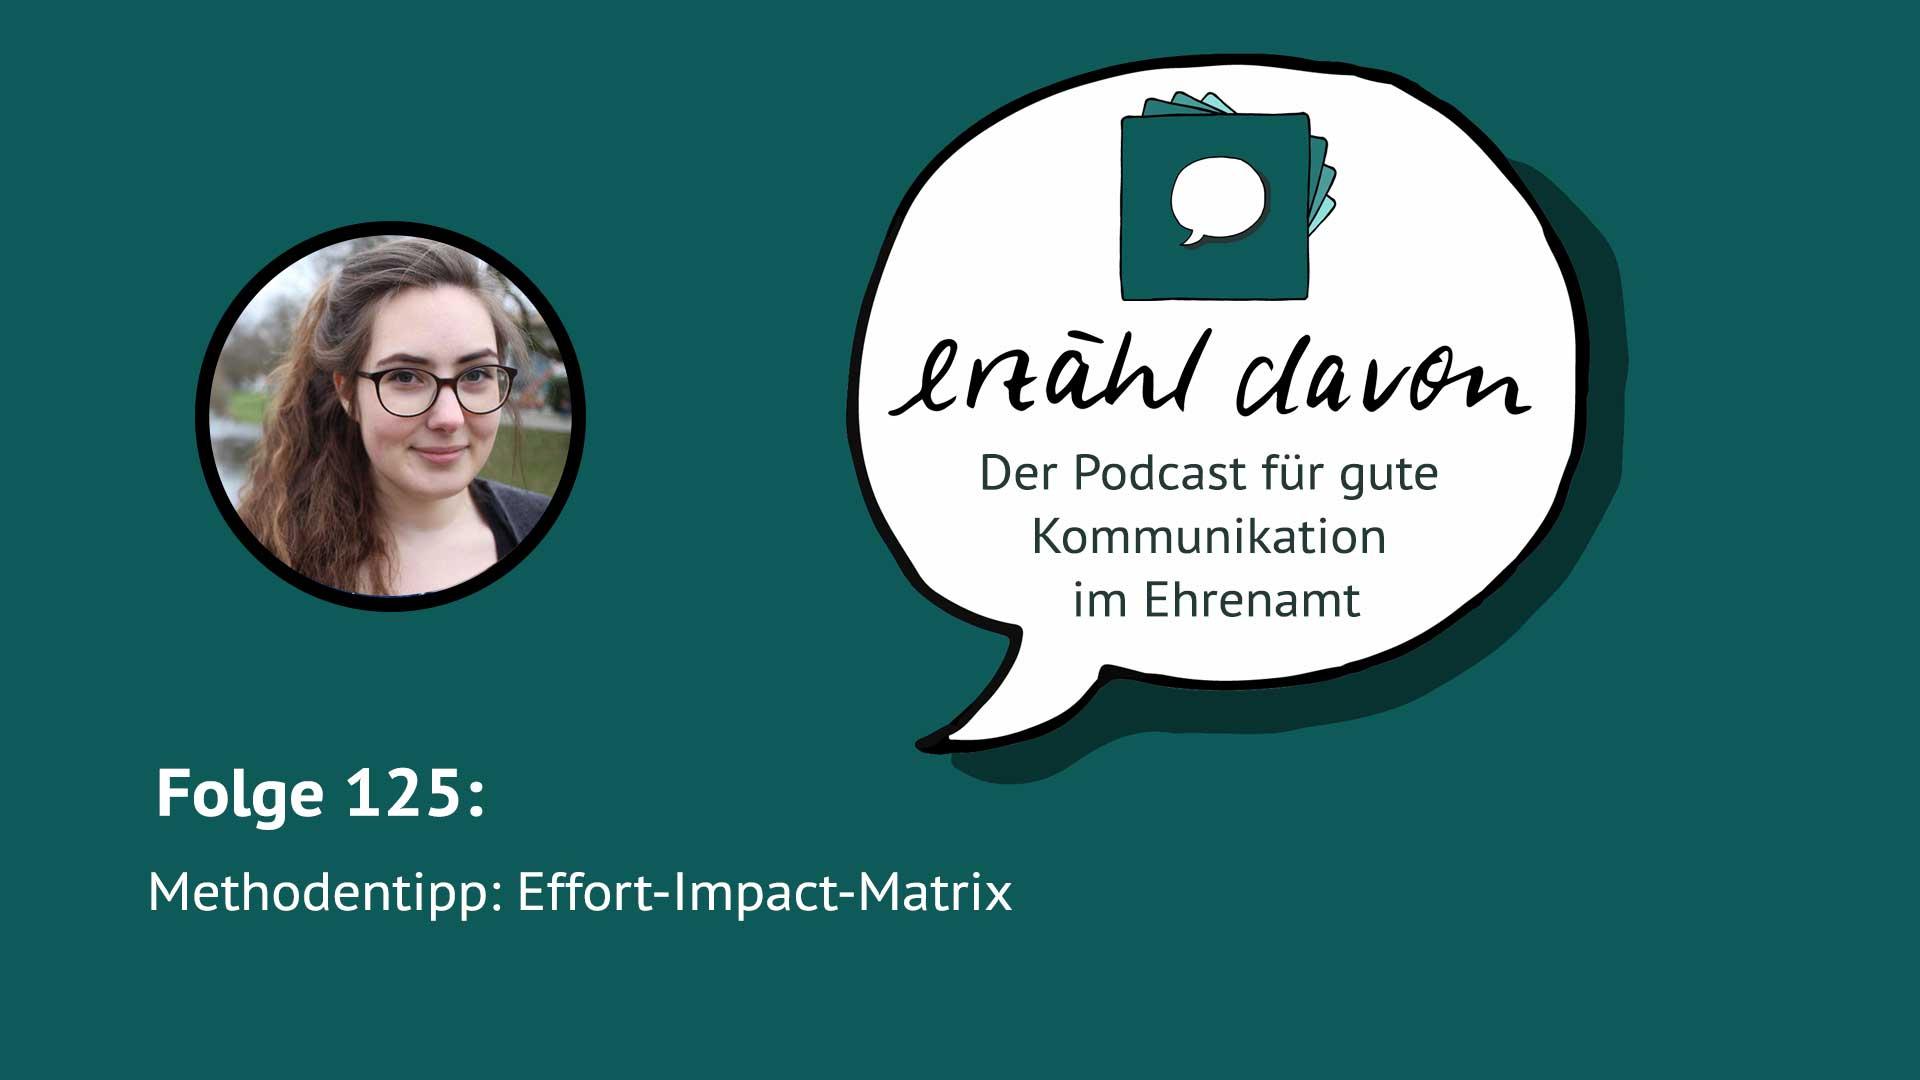 Methodentipp: Effort-Impact-Matrix